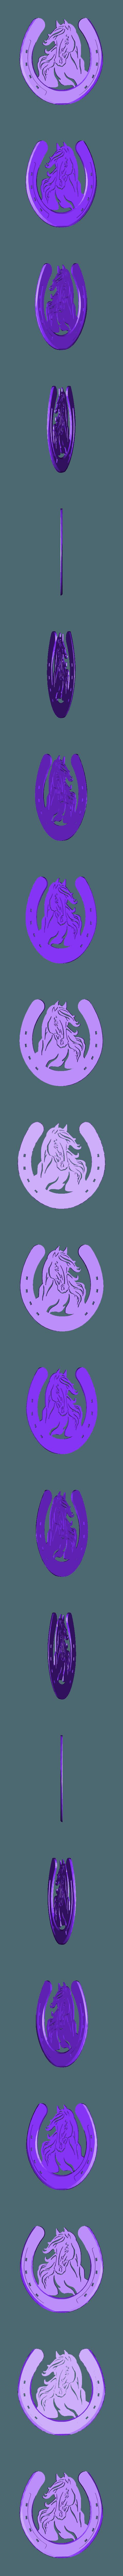 Sous verre Fer a cheval.stl Download STL file Under glass horseshoe / Horse shoe coaster • 3D print model, JustPriNt3D